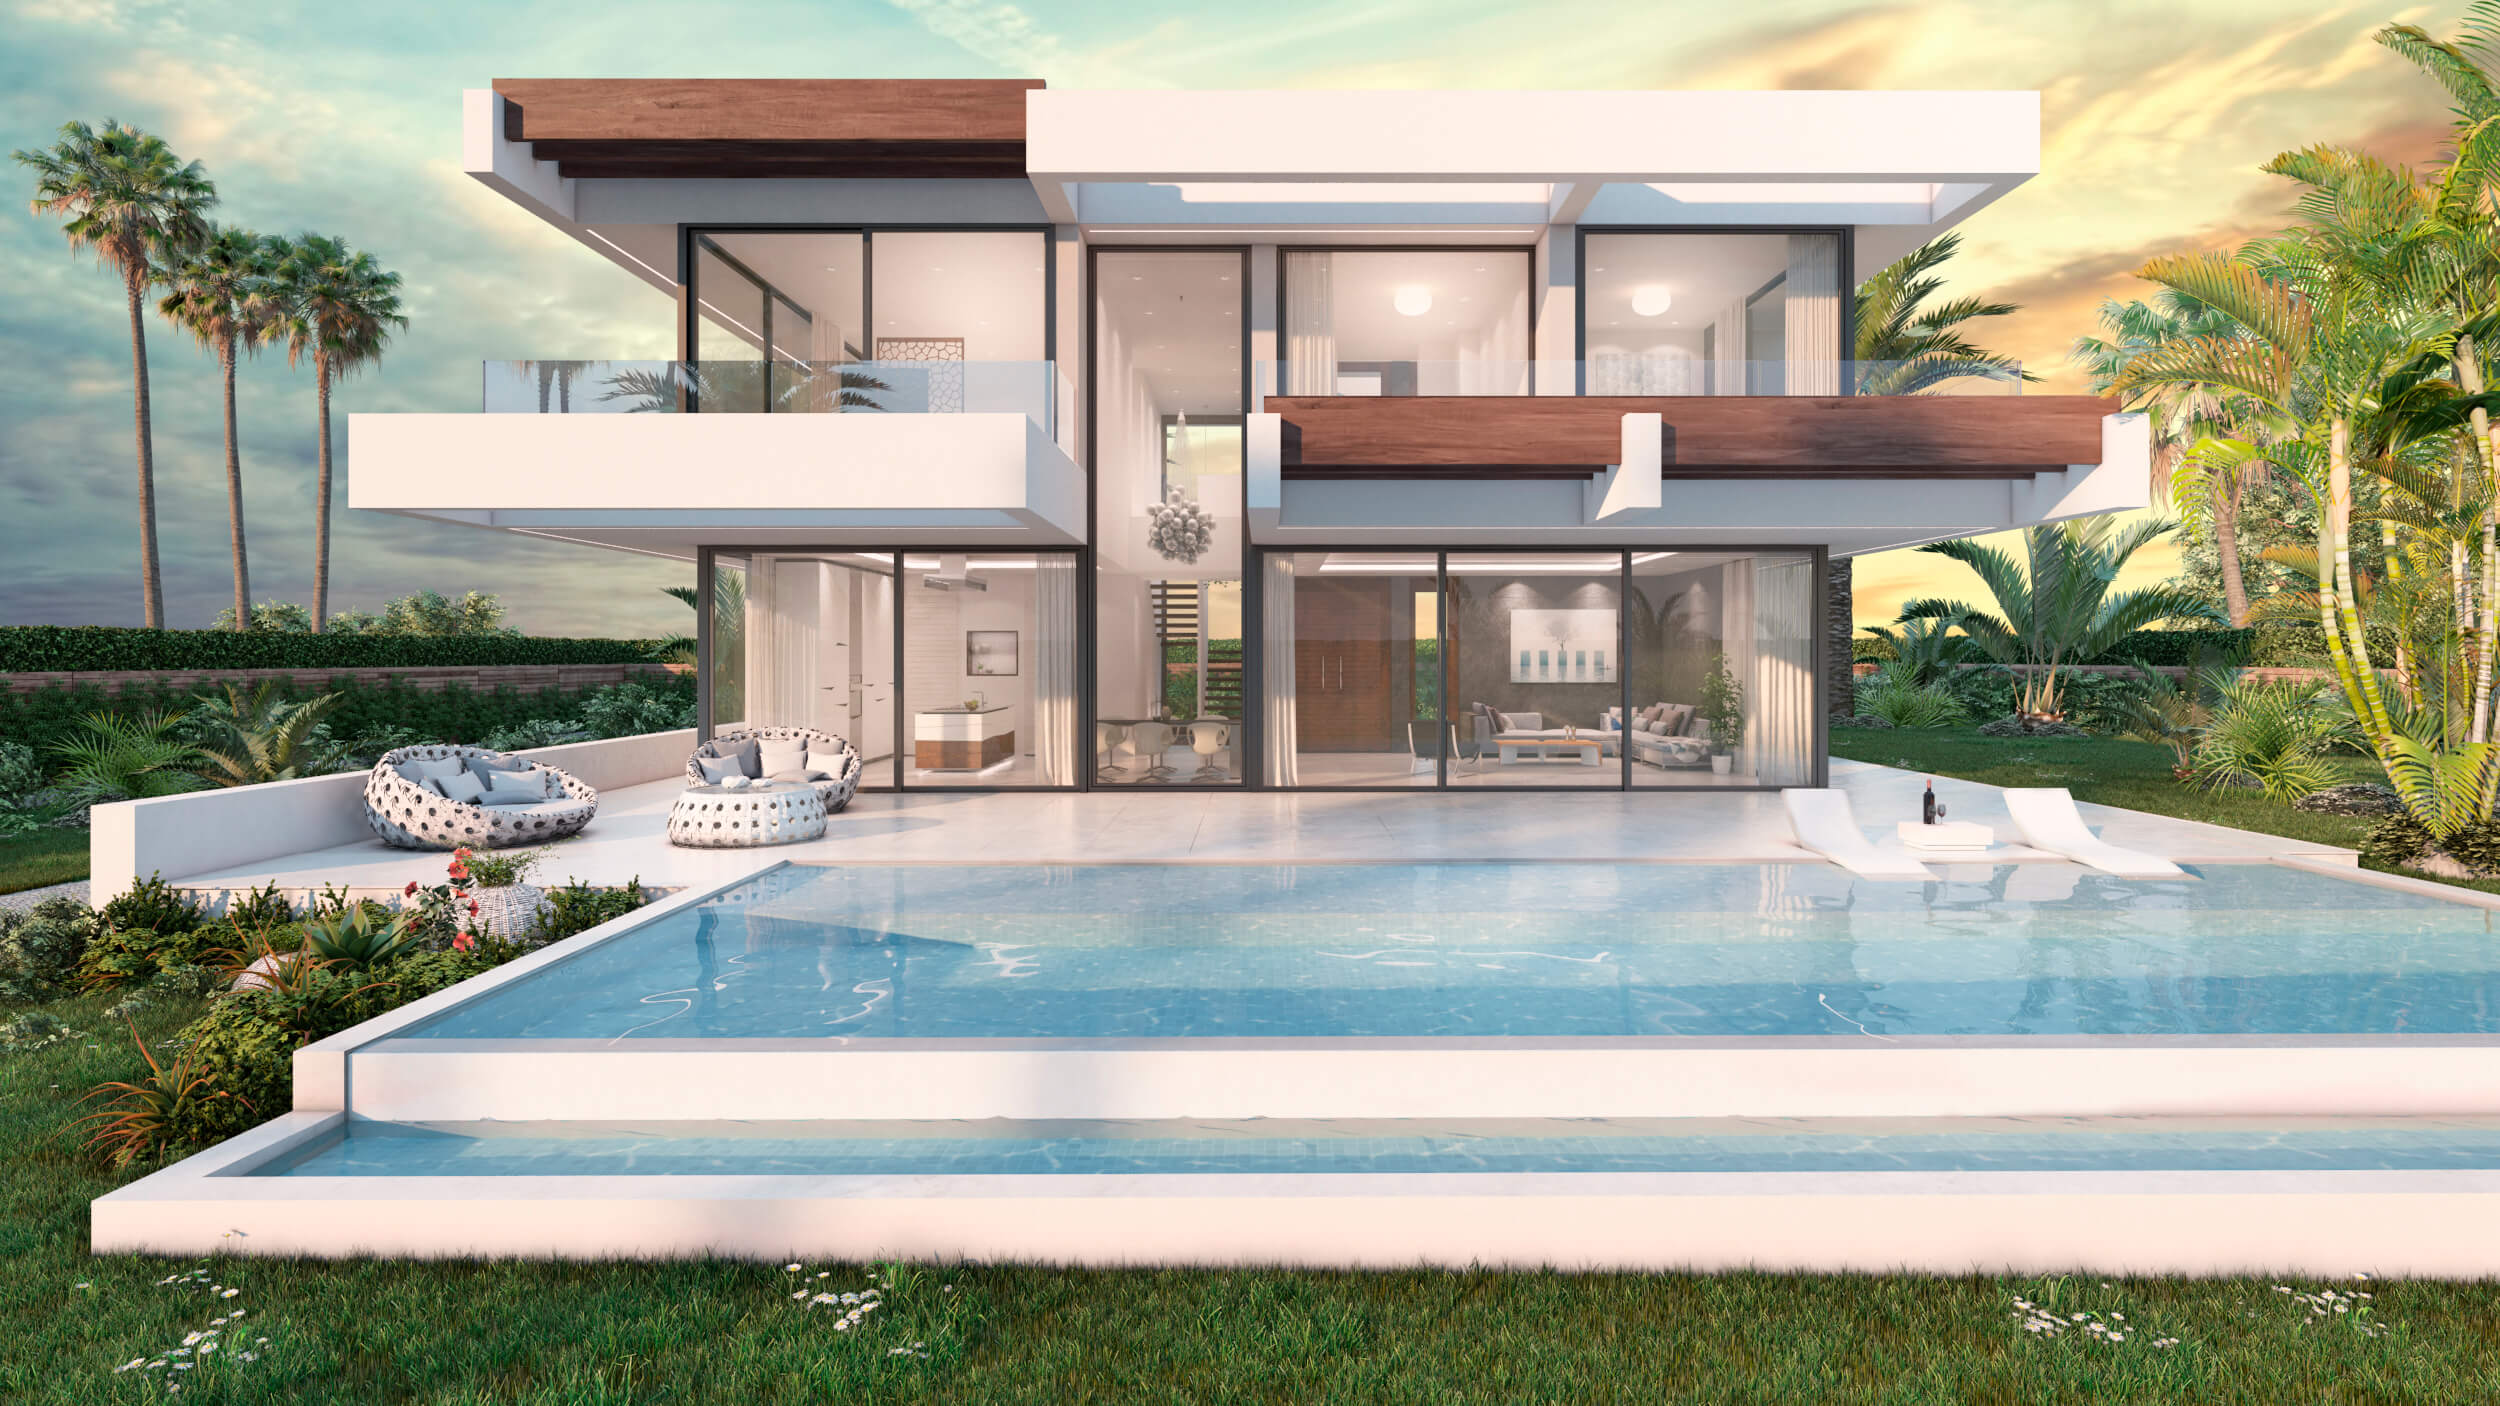 nieuwbouw villa te koop linda vista san pedro marbella zwembad